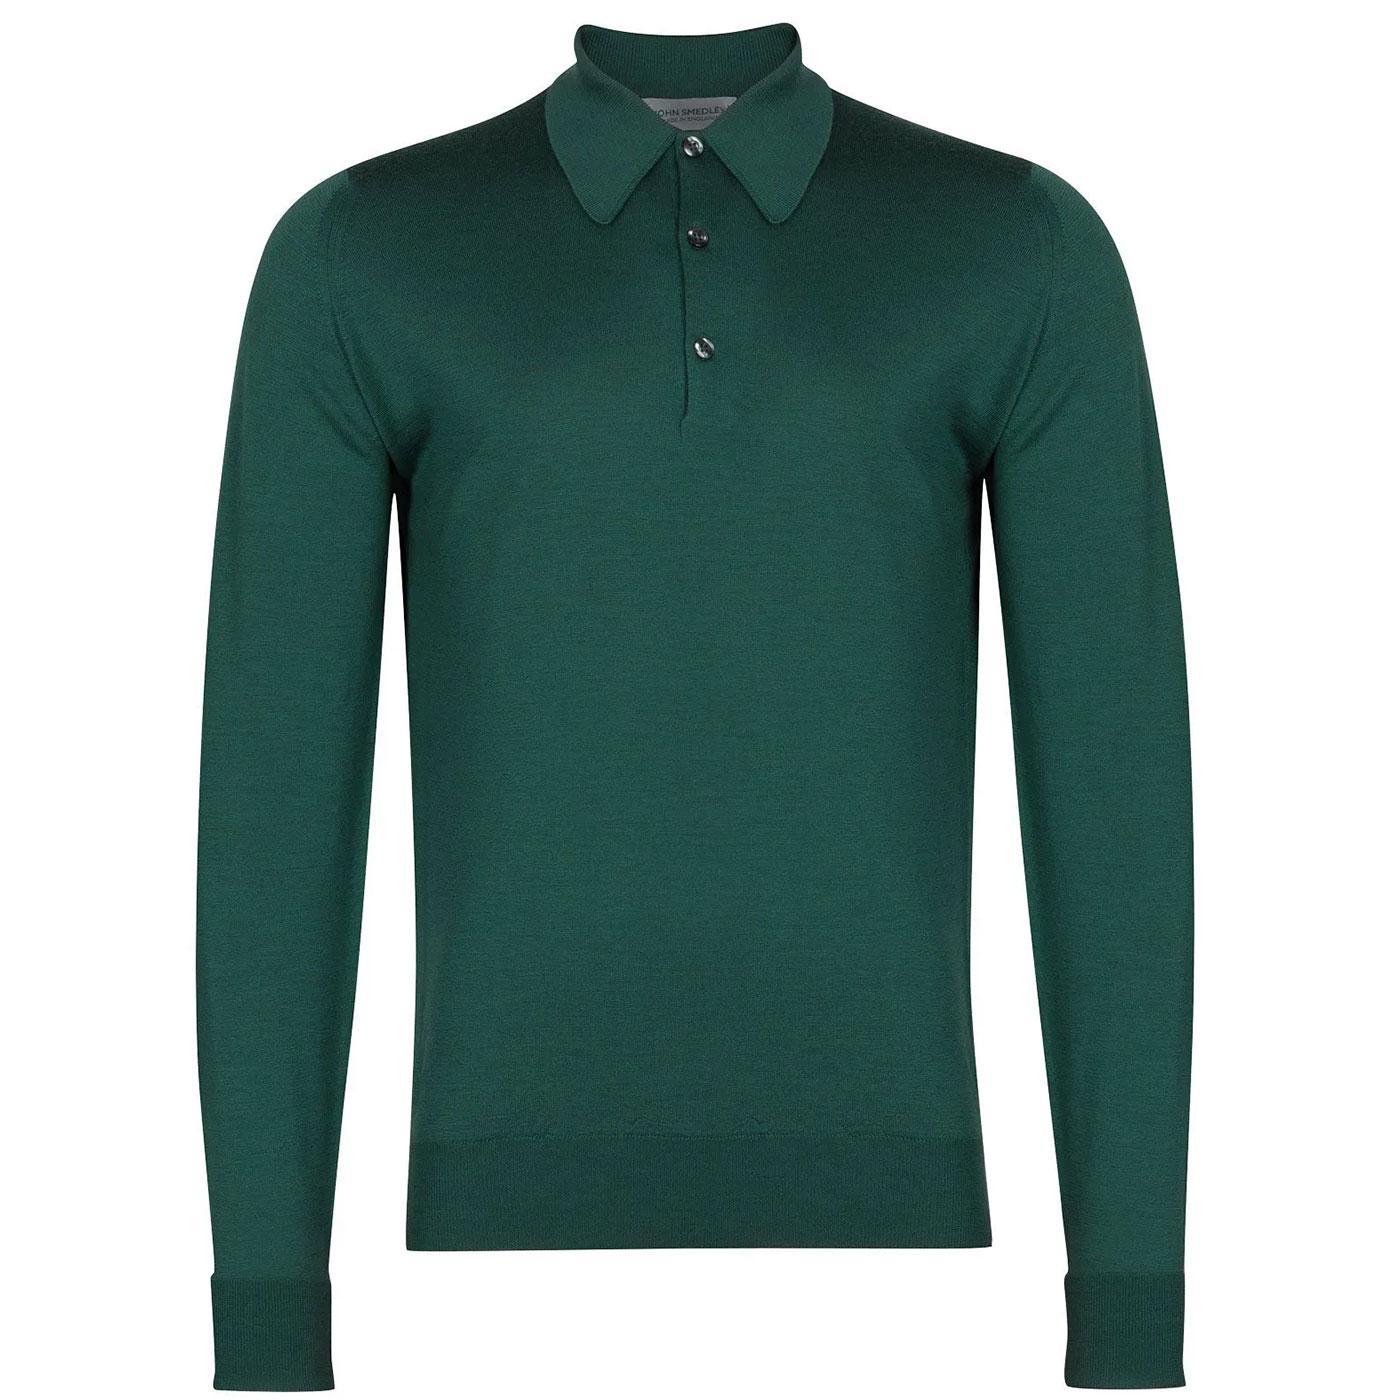 Dorset JOHN SMEDLEY Mens Mod Knitted Polo Shirt DE